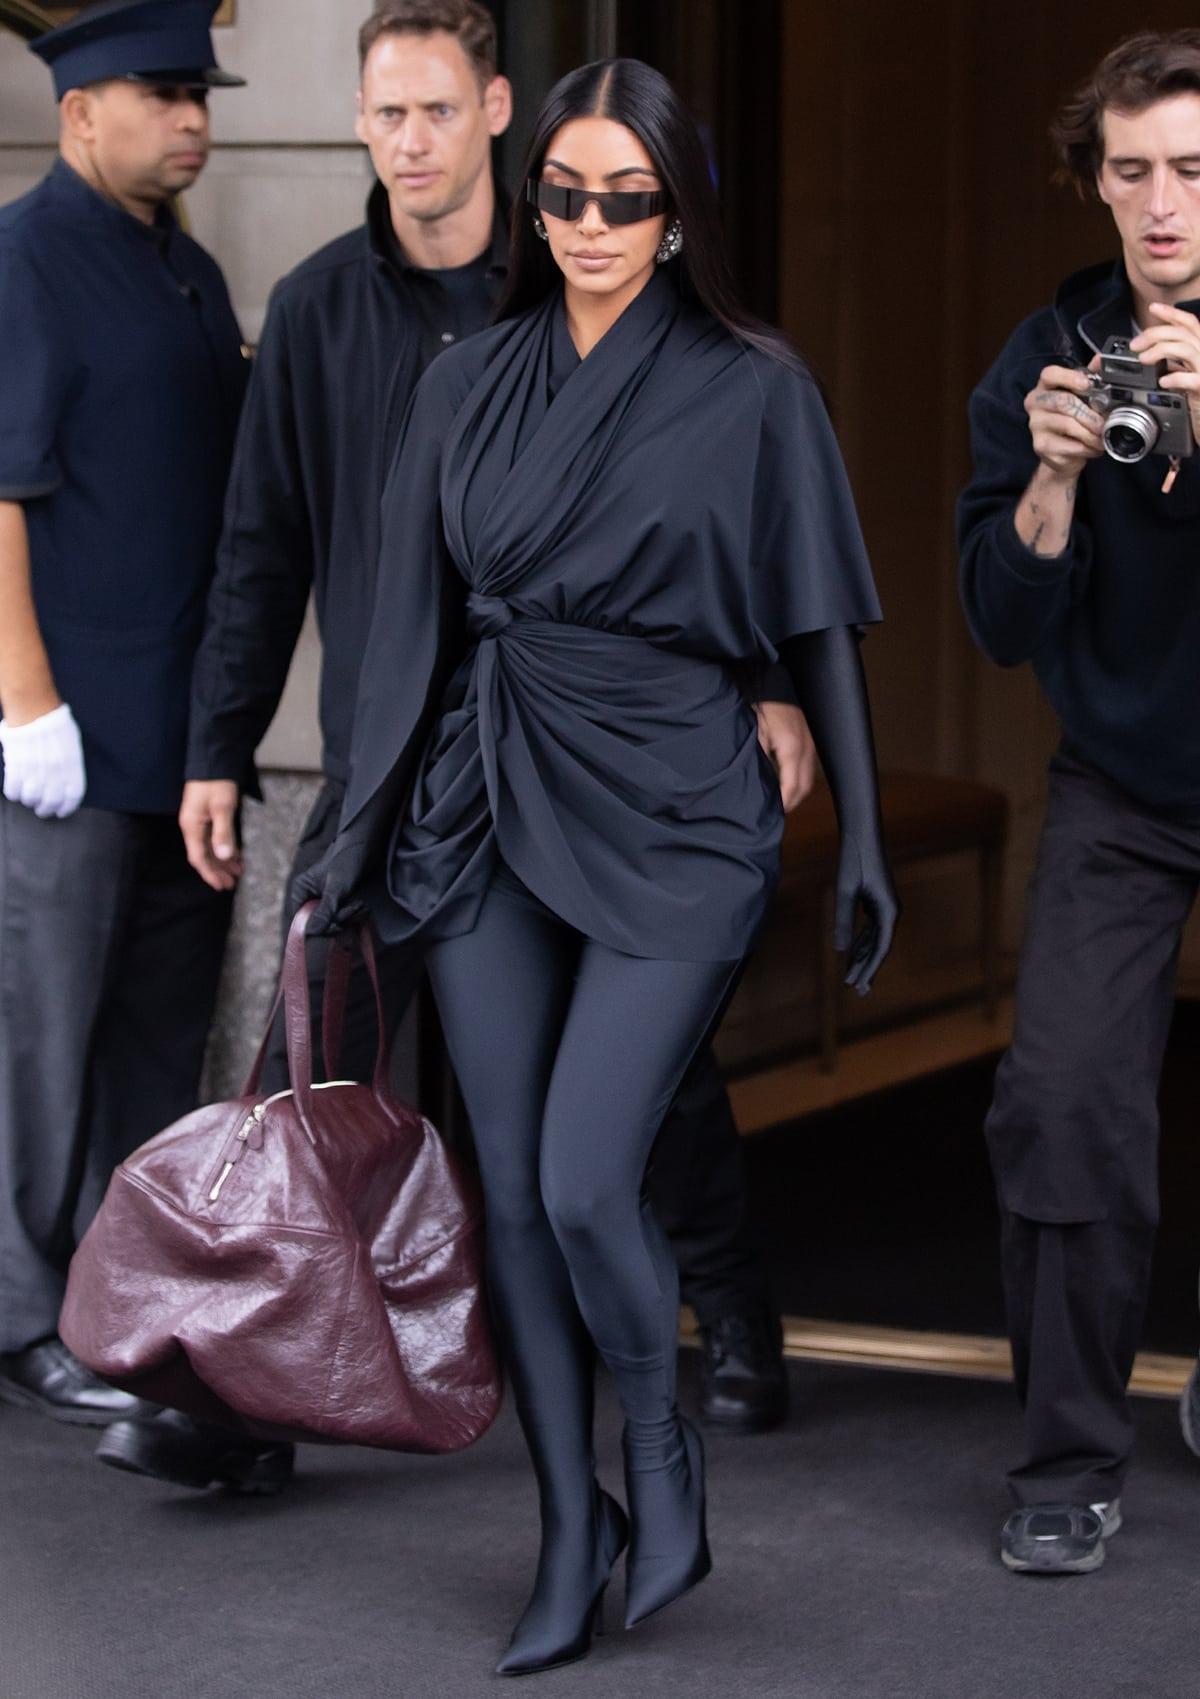 Kim Kardashian heads to Saturday Night Live rehearsals in New York City